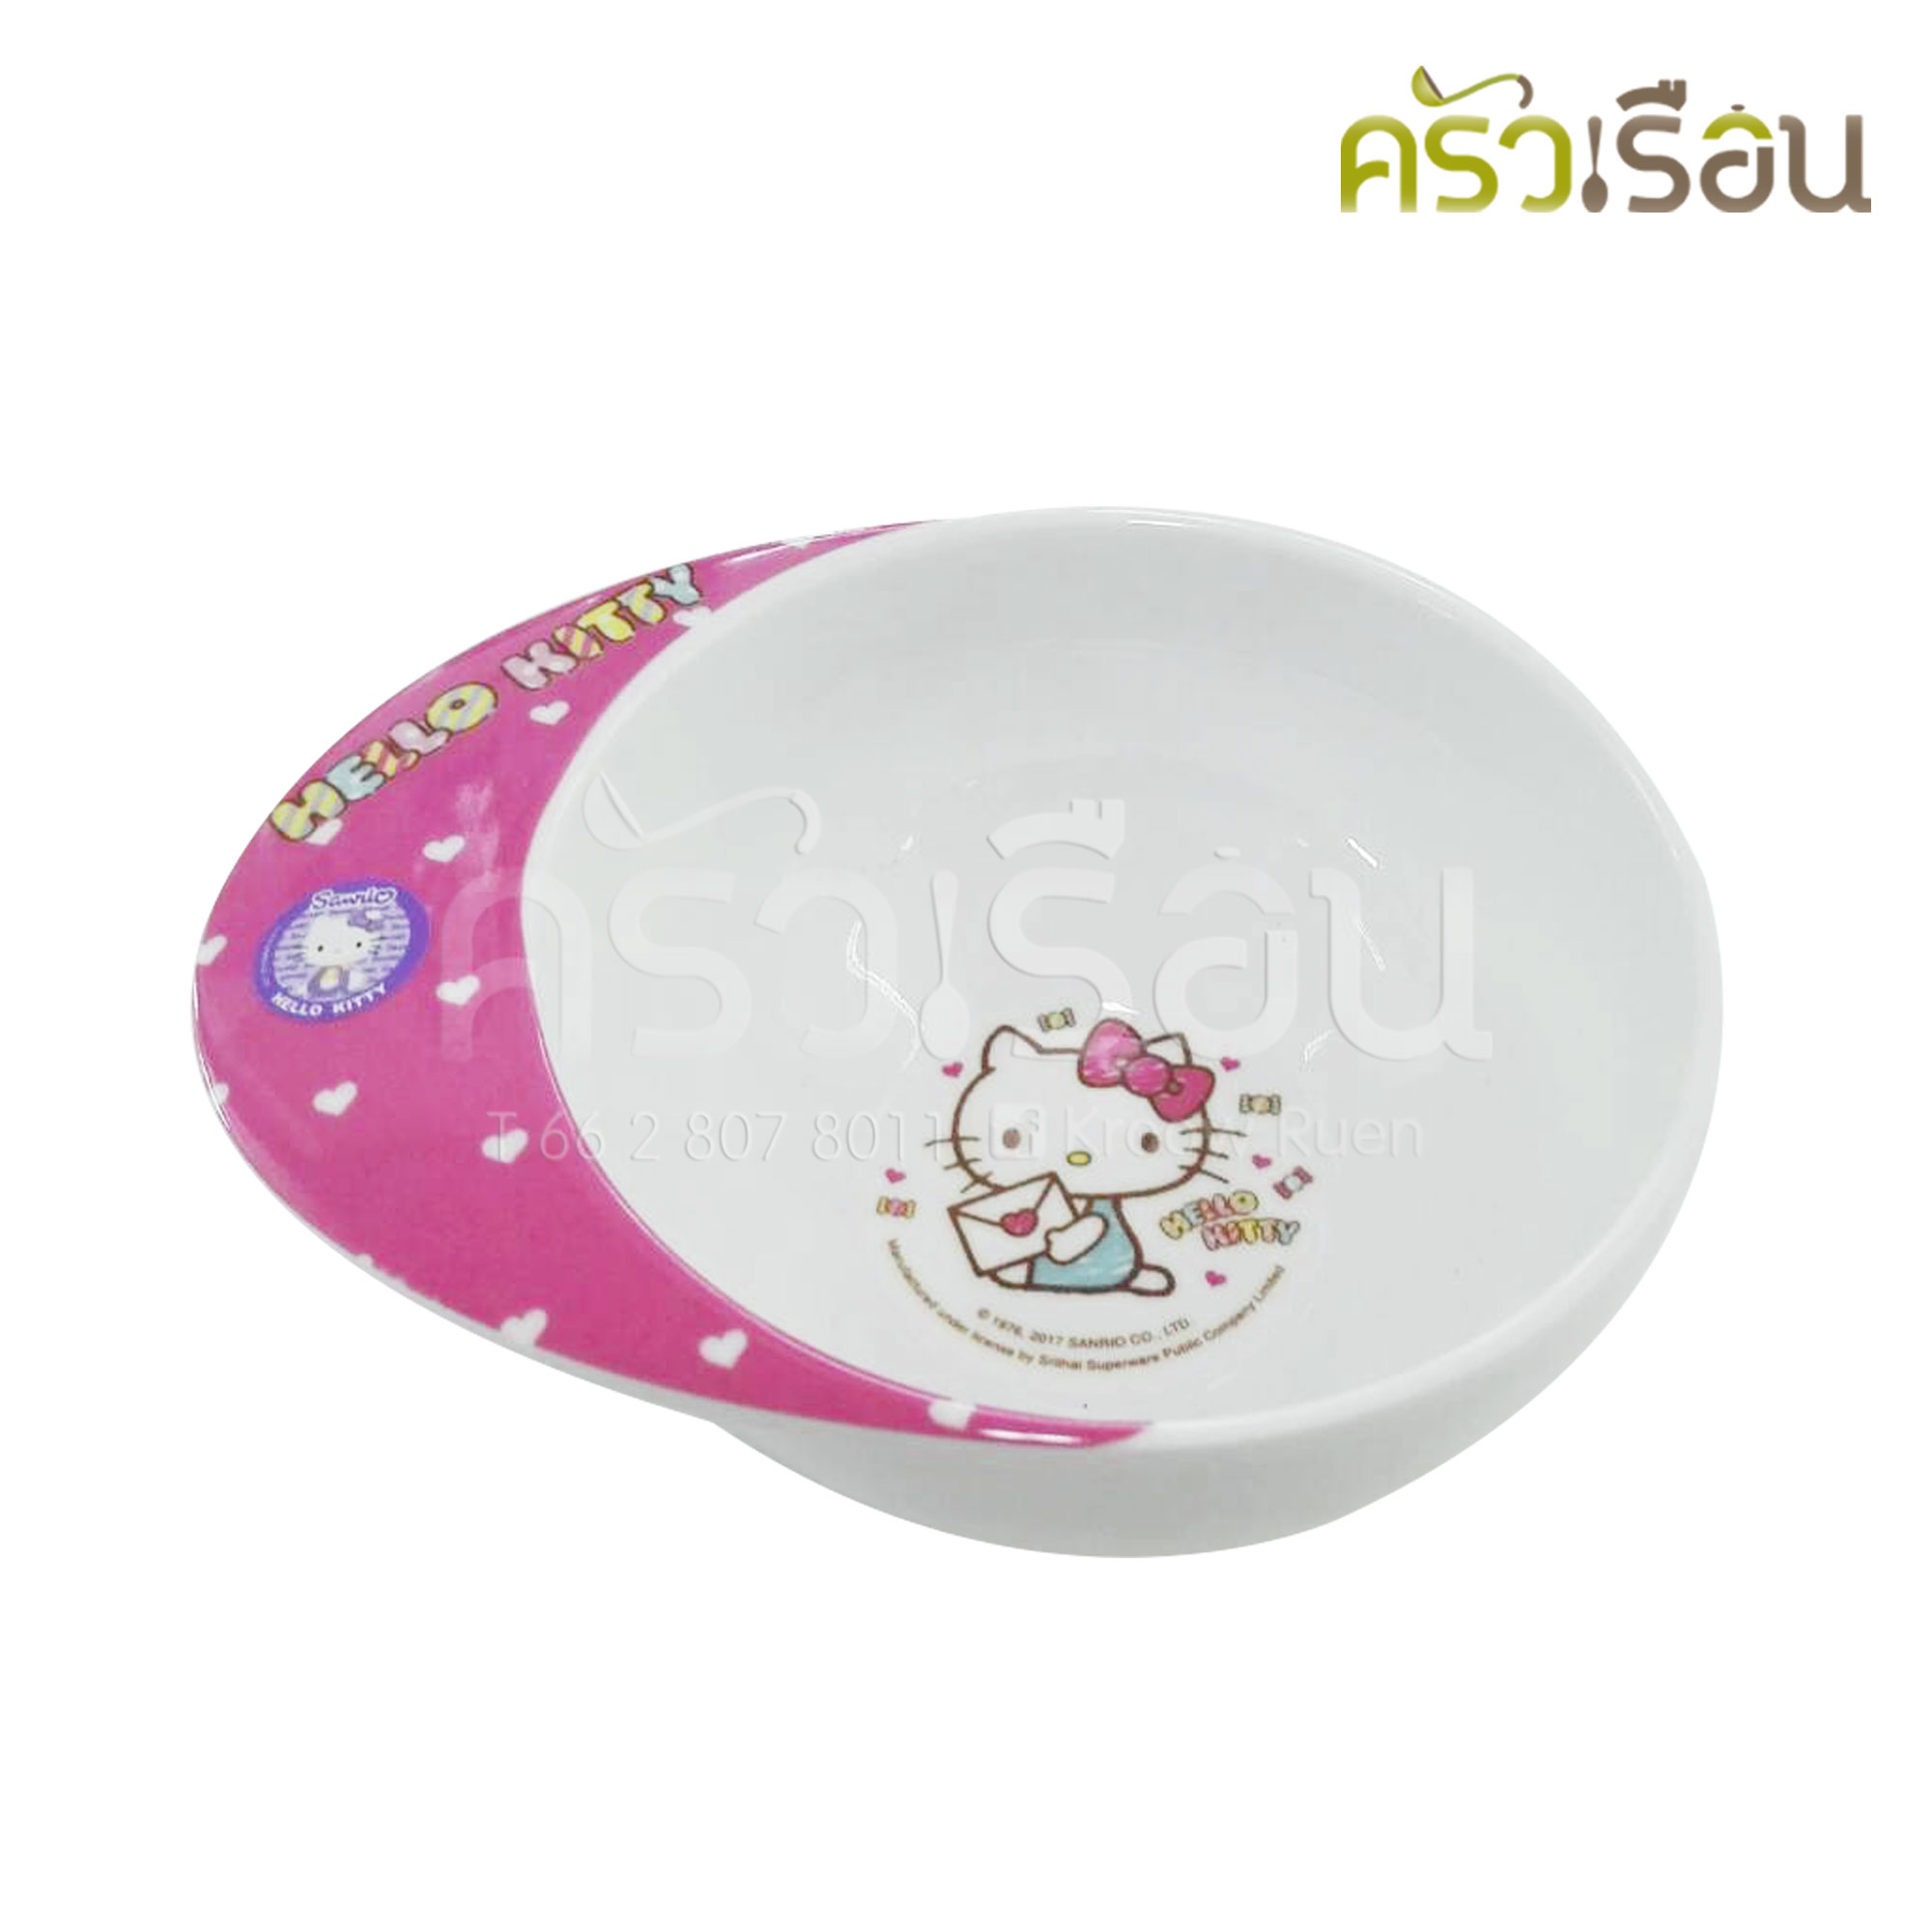 Superware ชามเด็ก Kitty Candy B6044-3.5